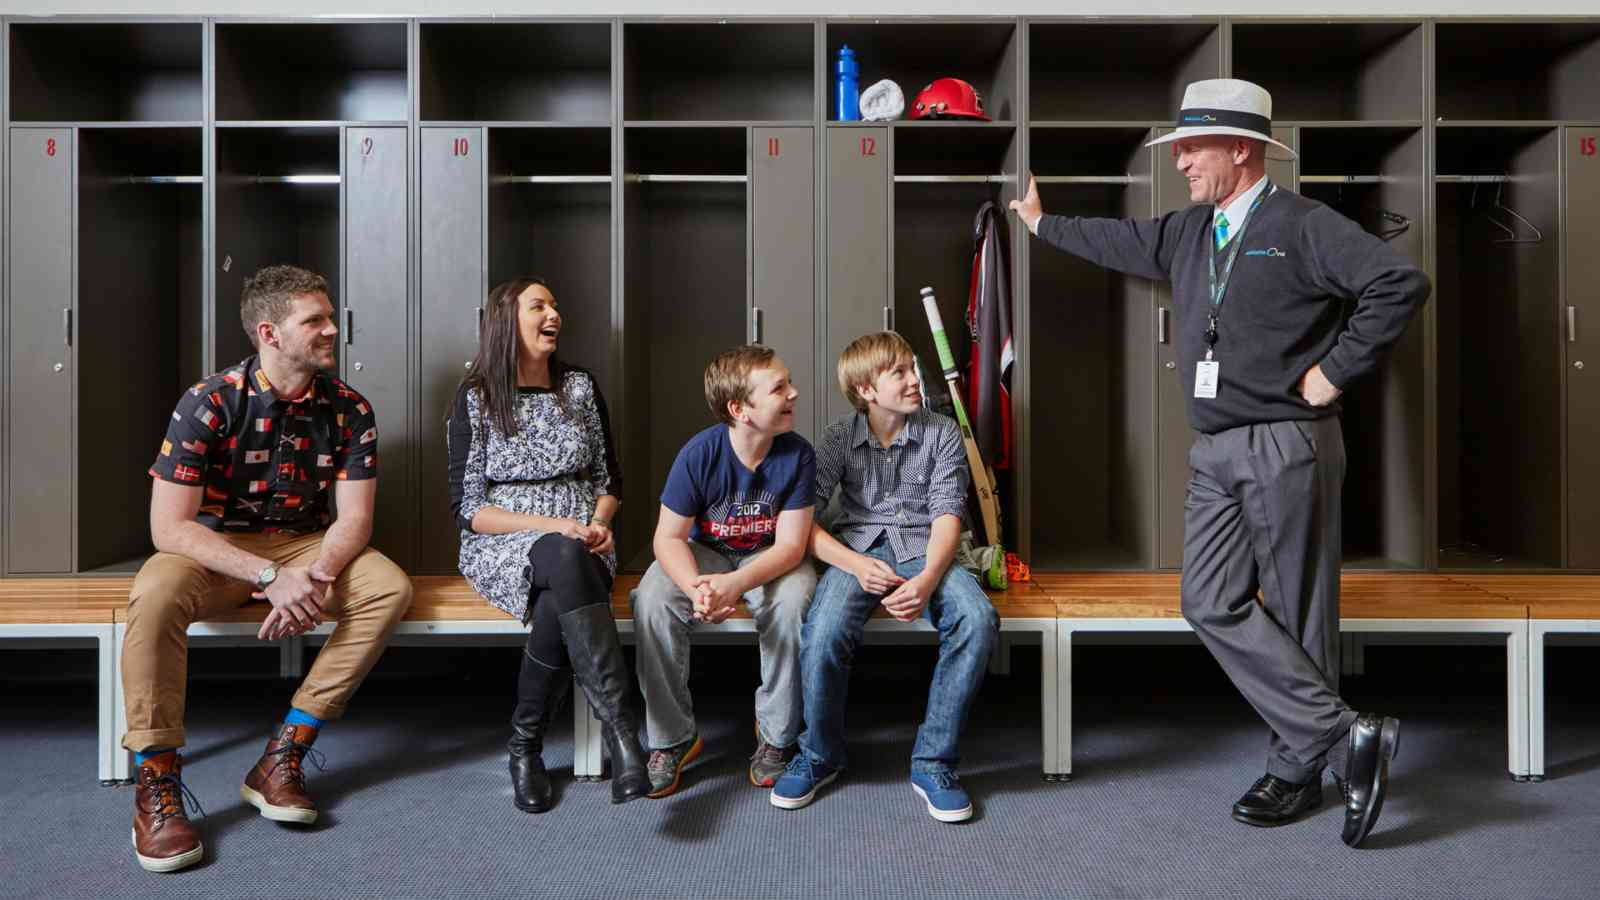 Adelaide Oval Locker Rooms